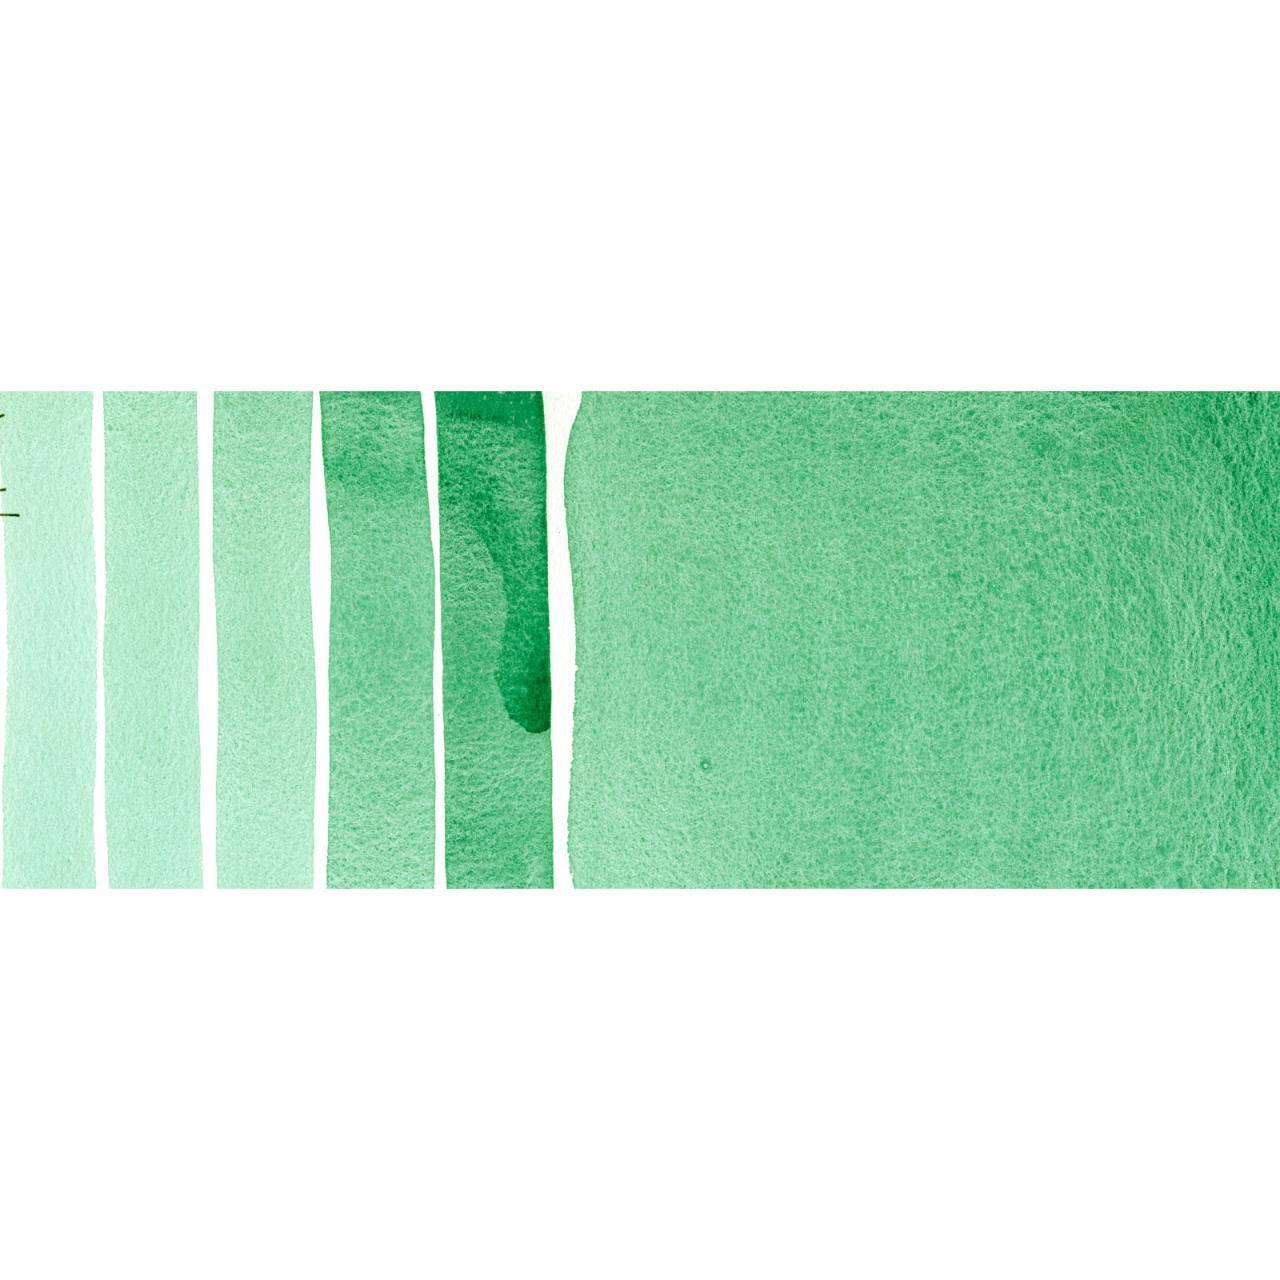 Viridian, DANIEL SMITH Extra Fine Watercolors 5ml Tubes -